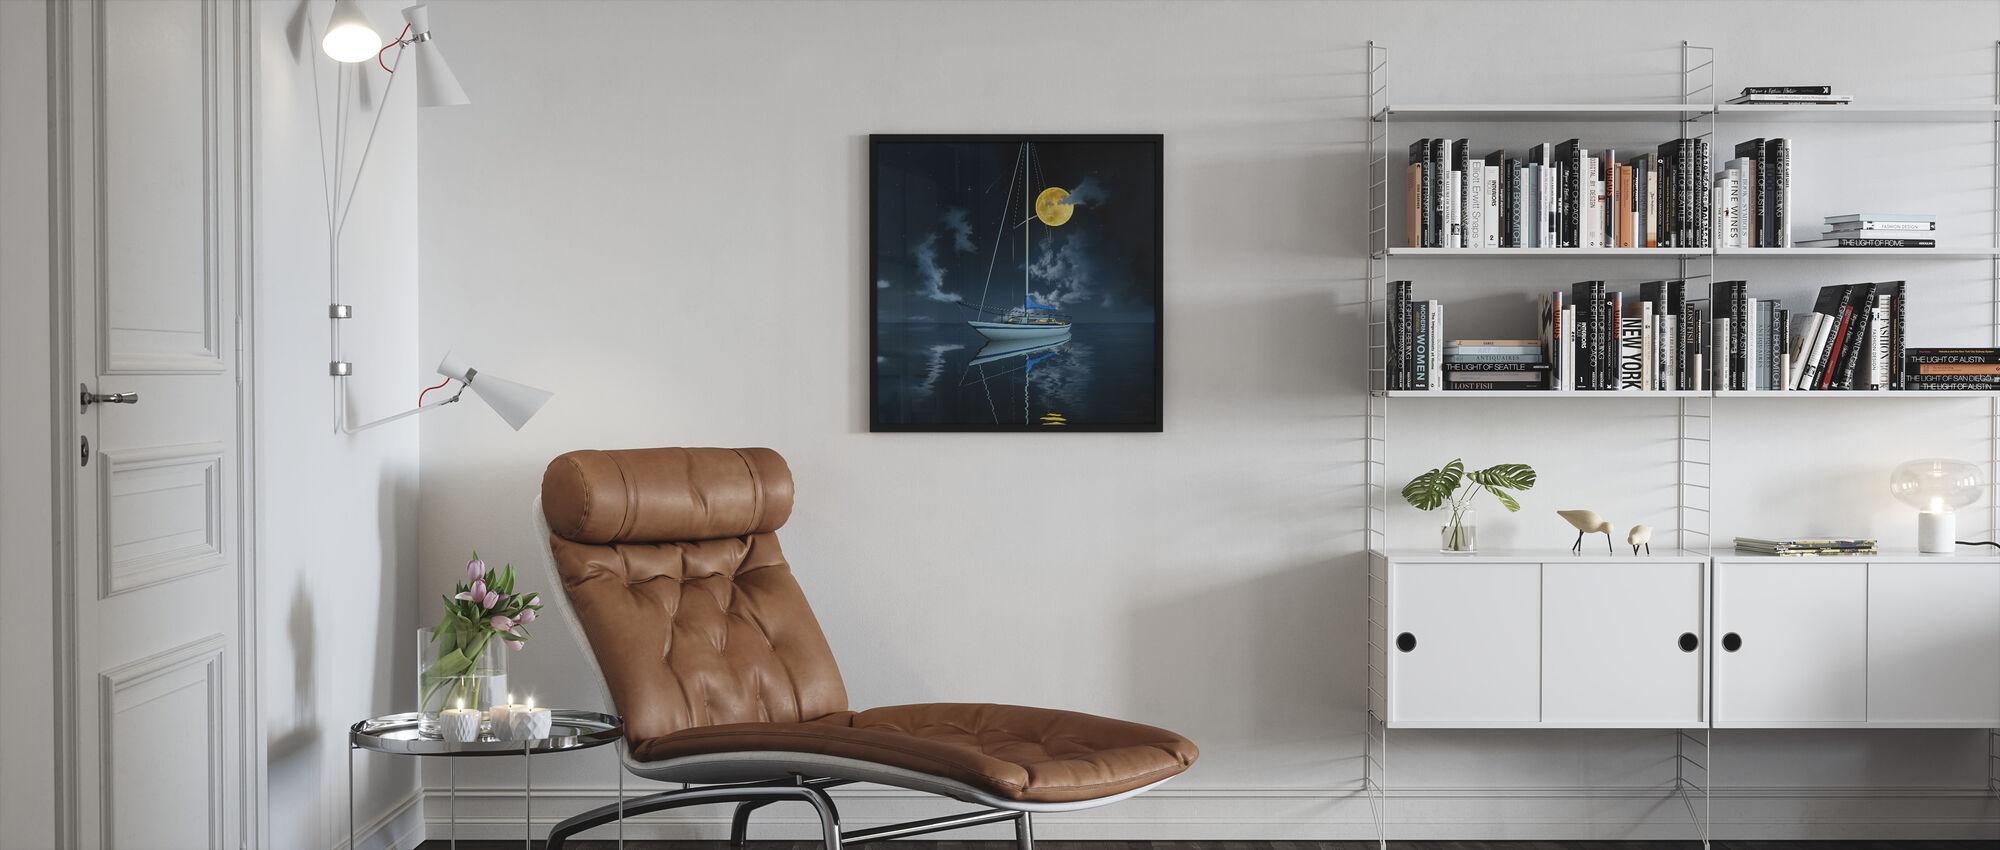 Sea of Dreams - Framed print - Living Room